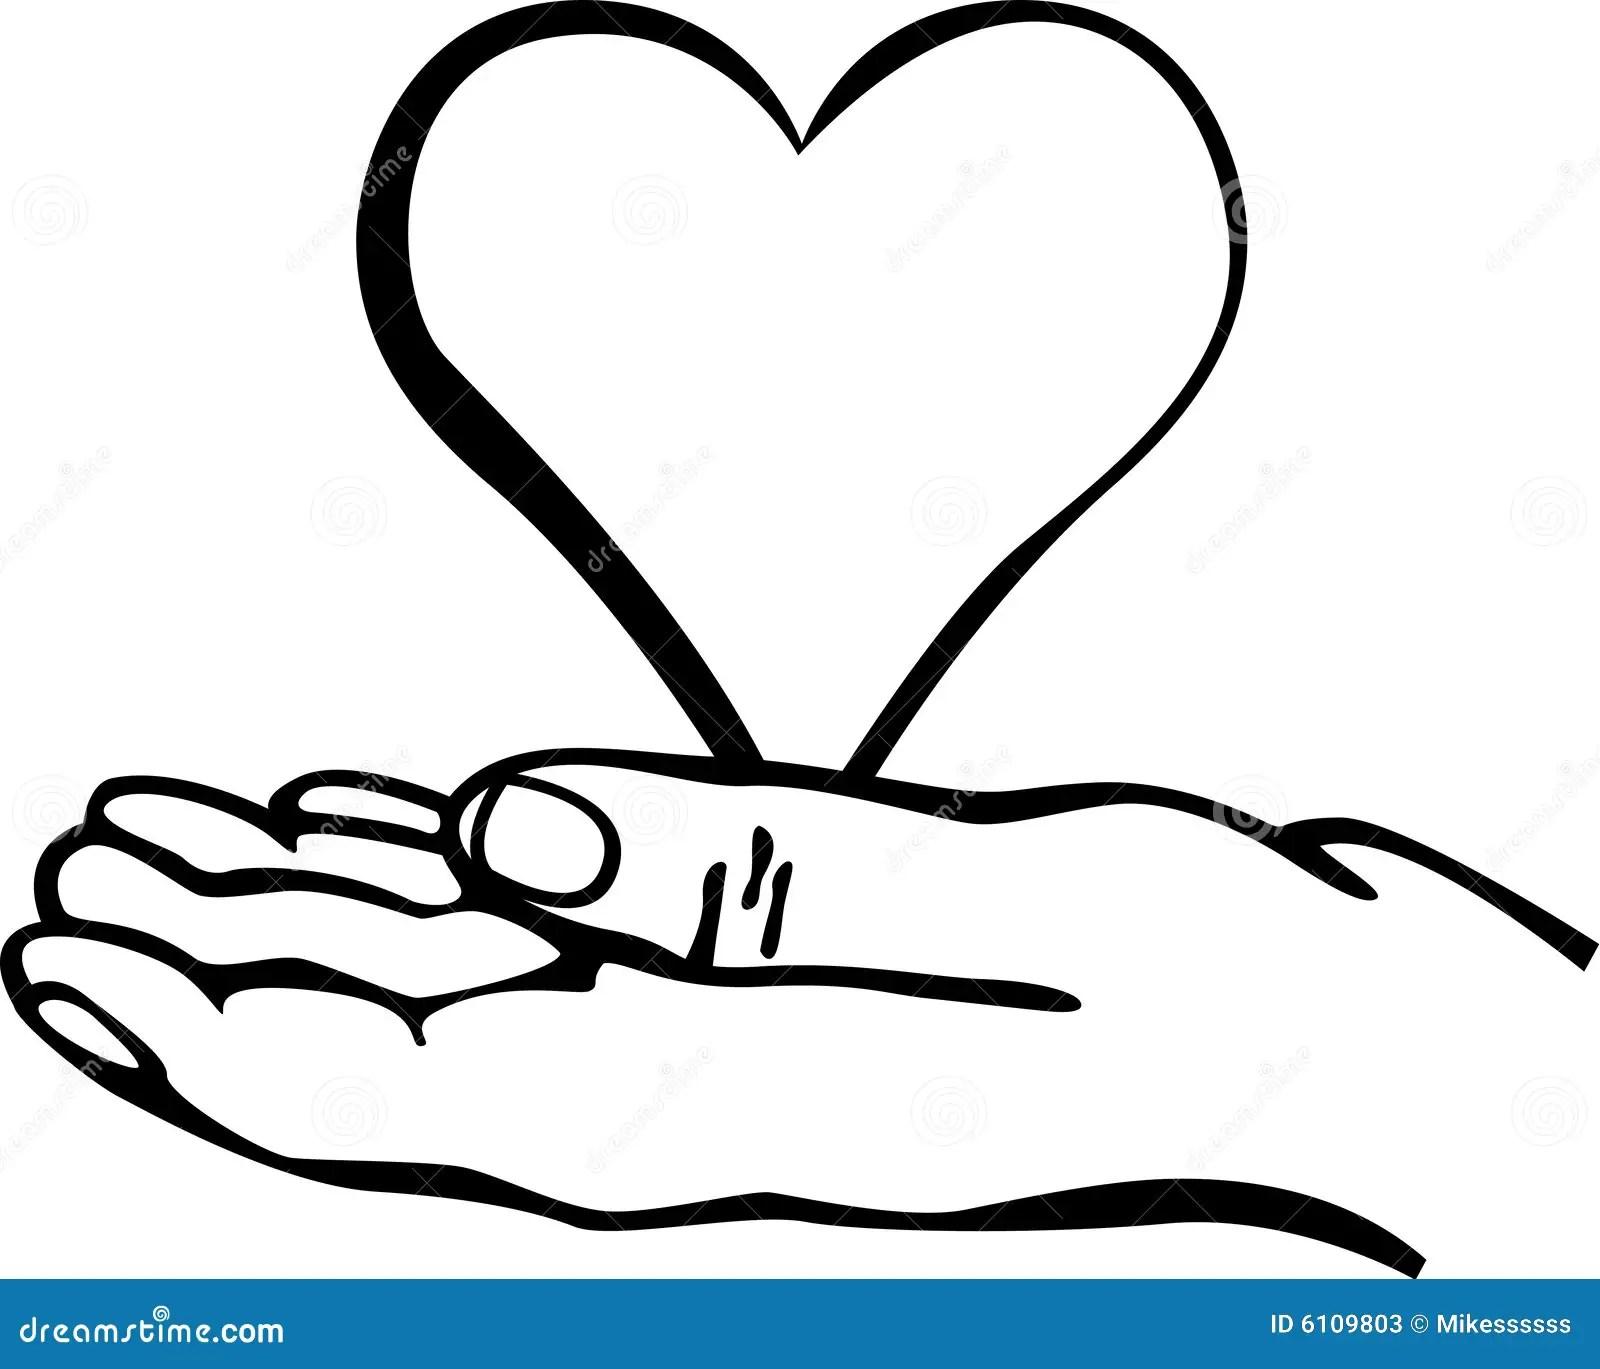 Hand Holding A Heart Vector Illustration Stock Vector